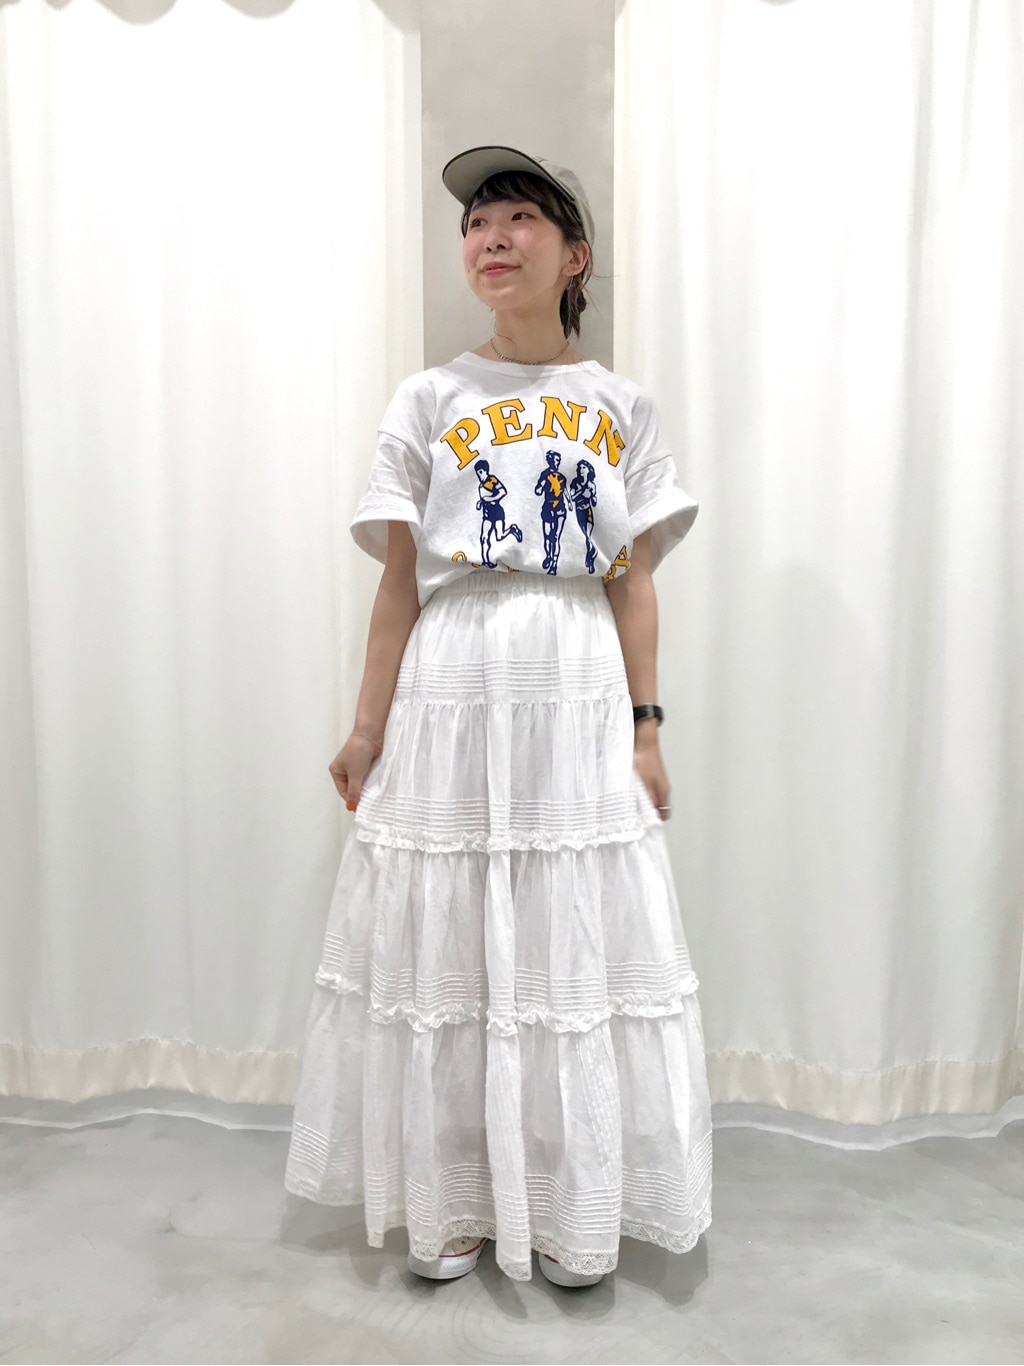 AMB SHOP PAR ICI CHILD WOMAN , PAR ICI 東京スカイツリータウン・ソラマチ 身長:154cm 2020.07.17